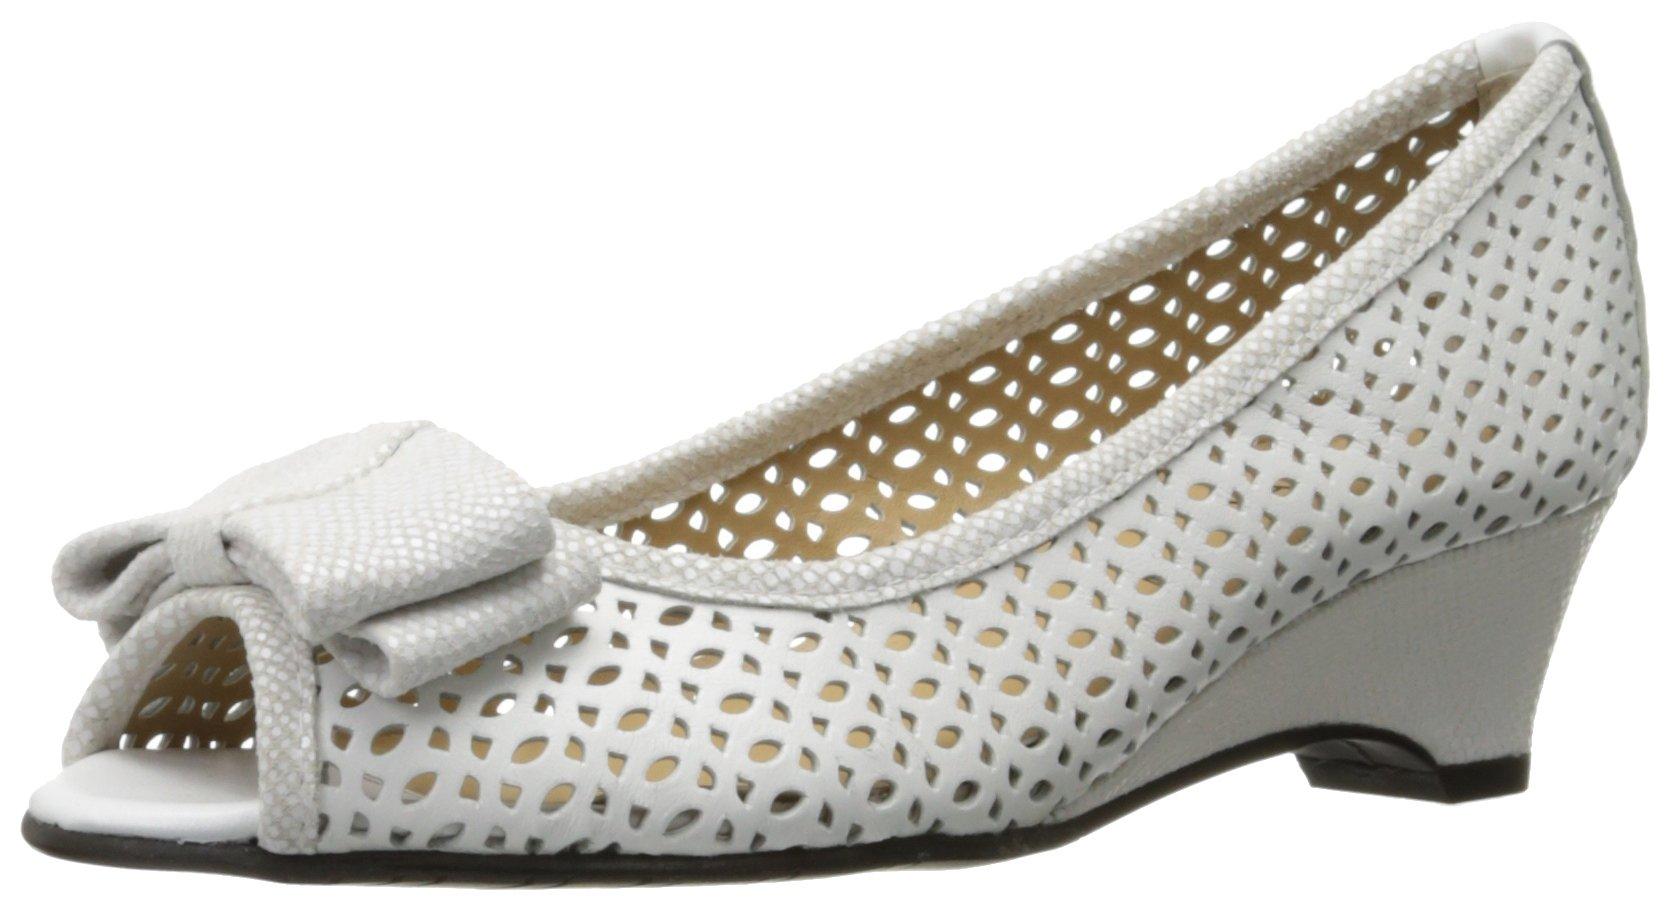 VANELi Women's Brinly Wedge Sandal, White Perfed Nappa/White Summer VIP, 7.5 N US